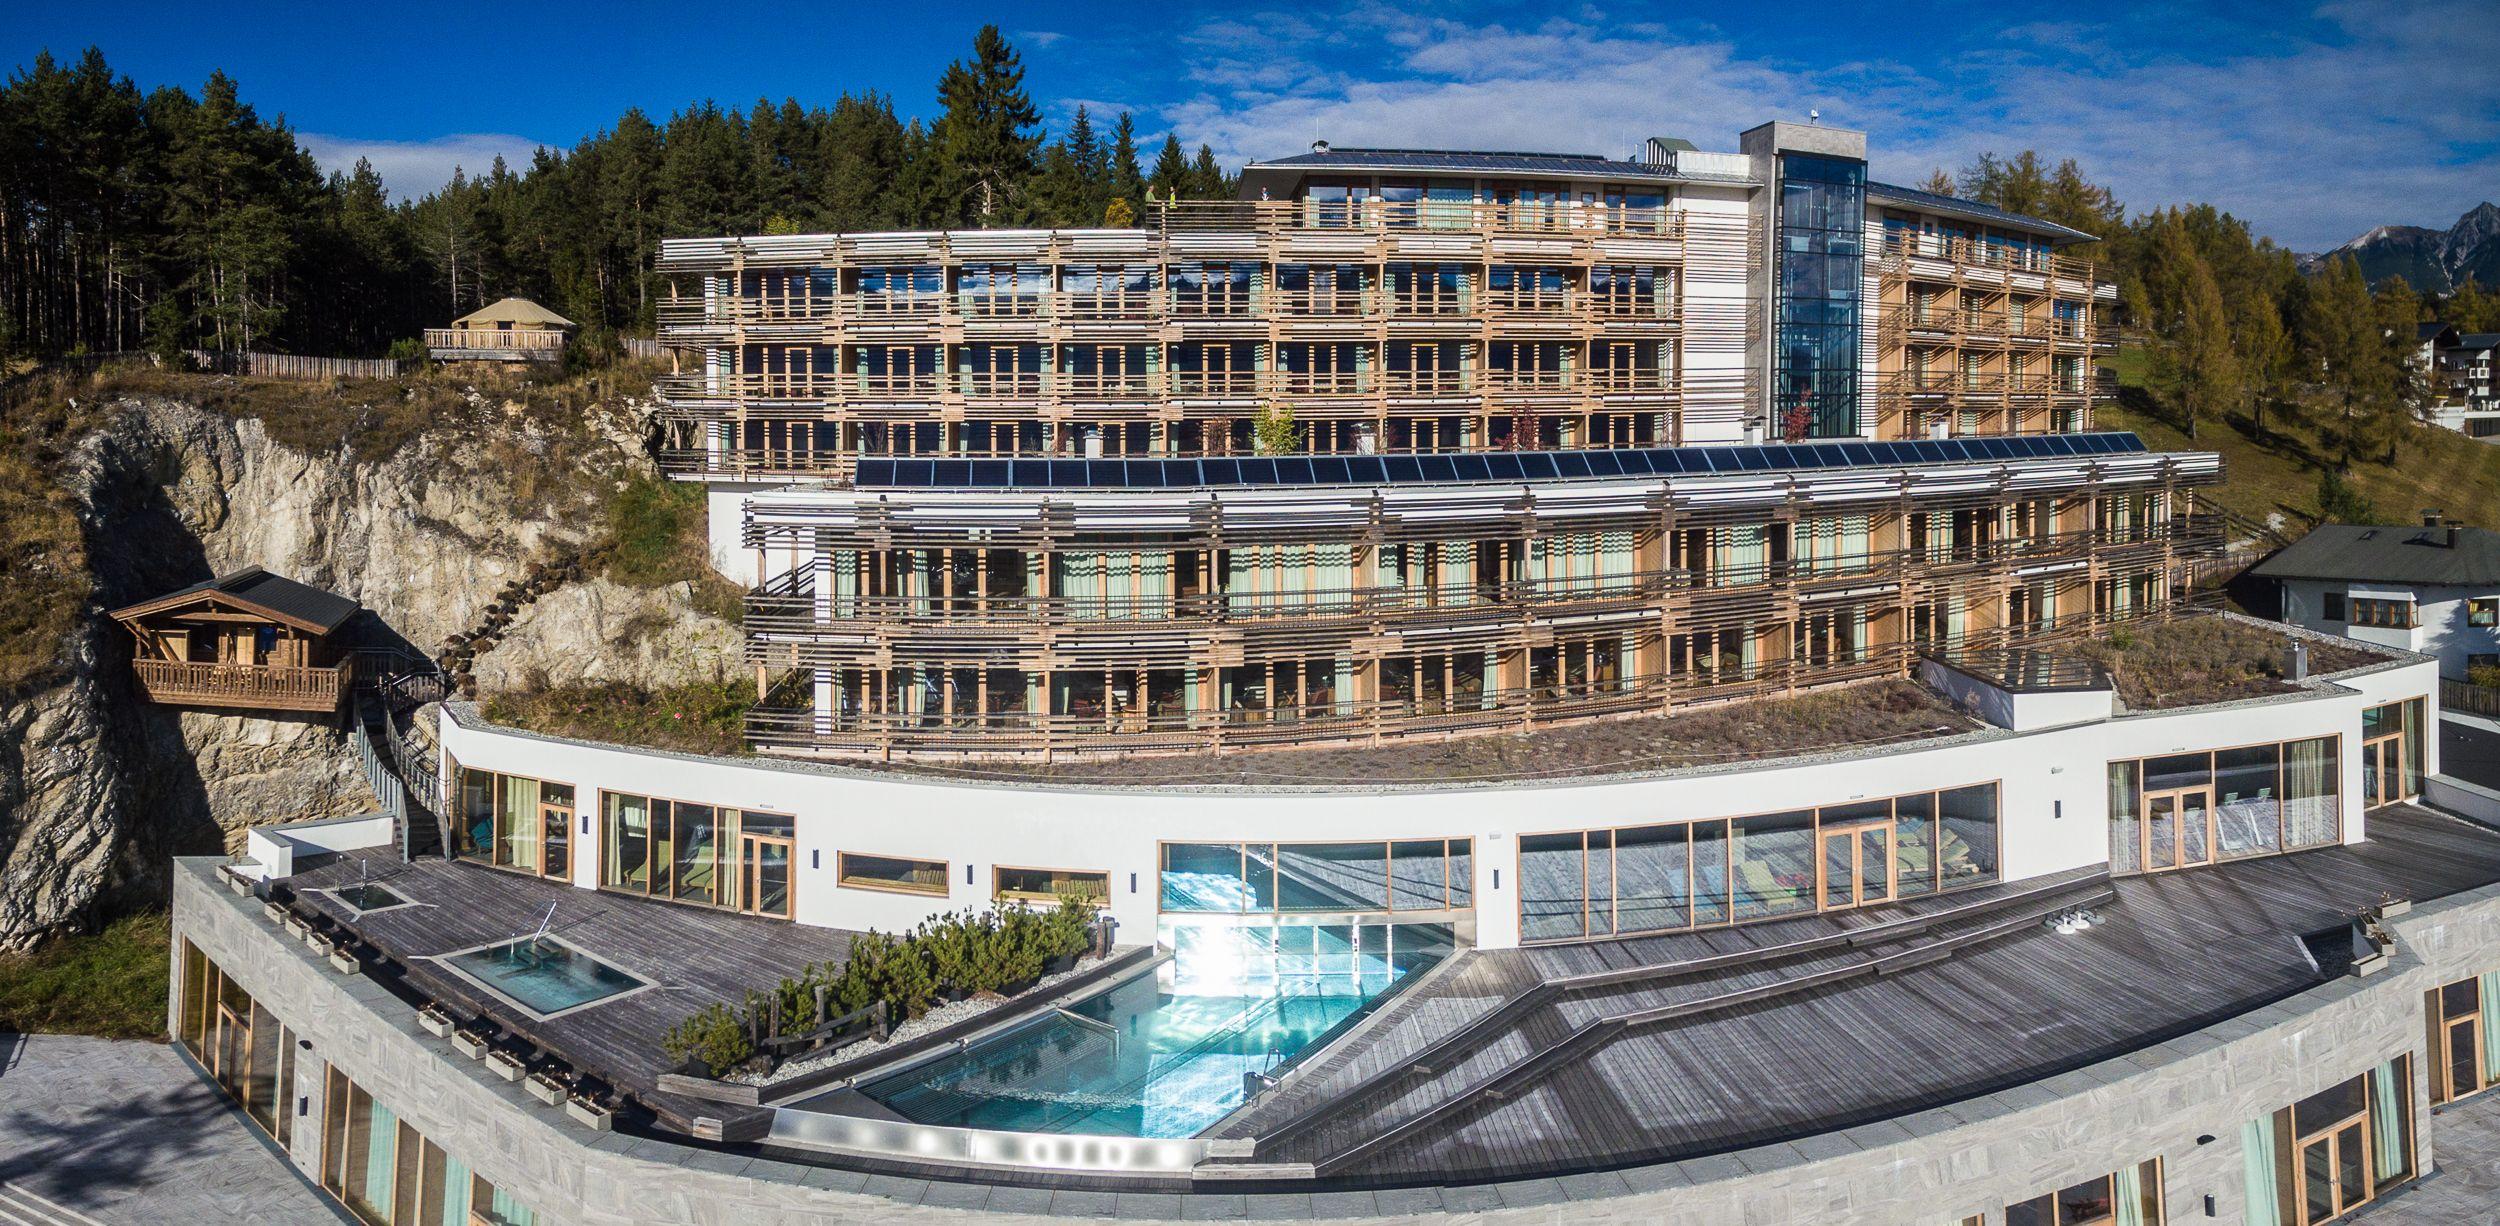 Nidum Casual Luxury Hotel In Seefeld Tirol Leadingsparesorts